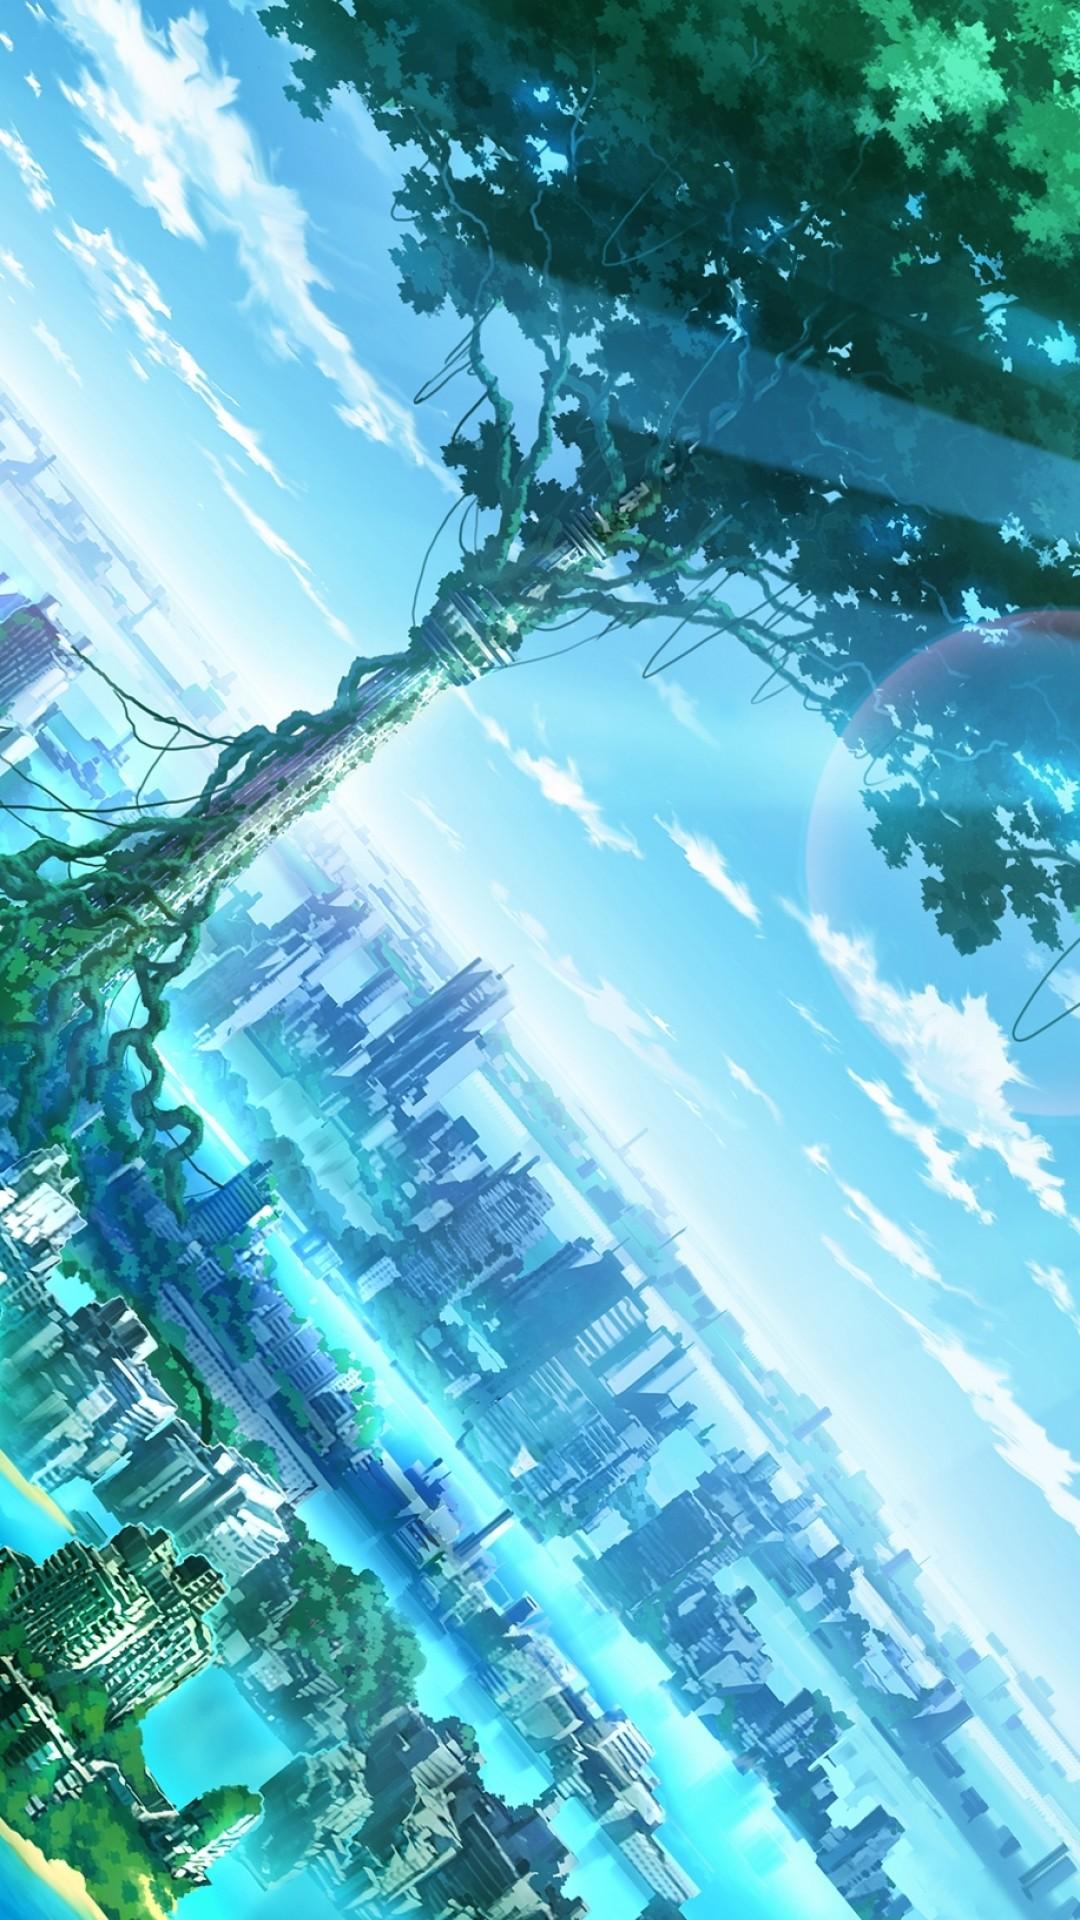 Anime landscape wallpapers 71 pictures - Portrait anime wallpaper ...